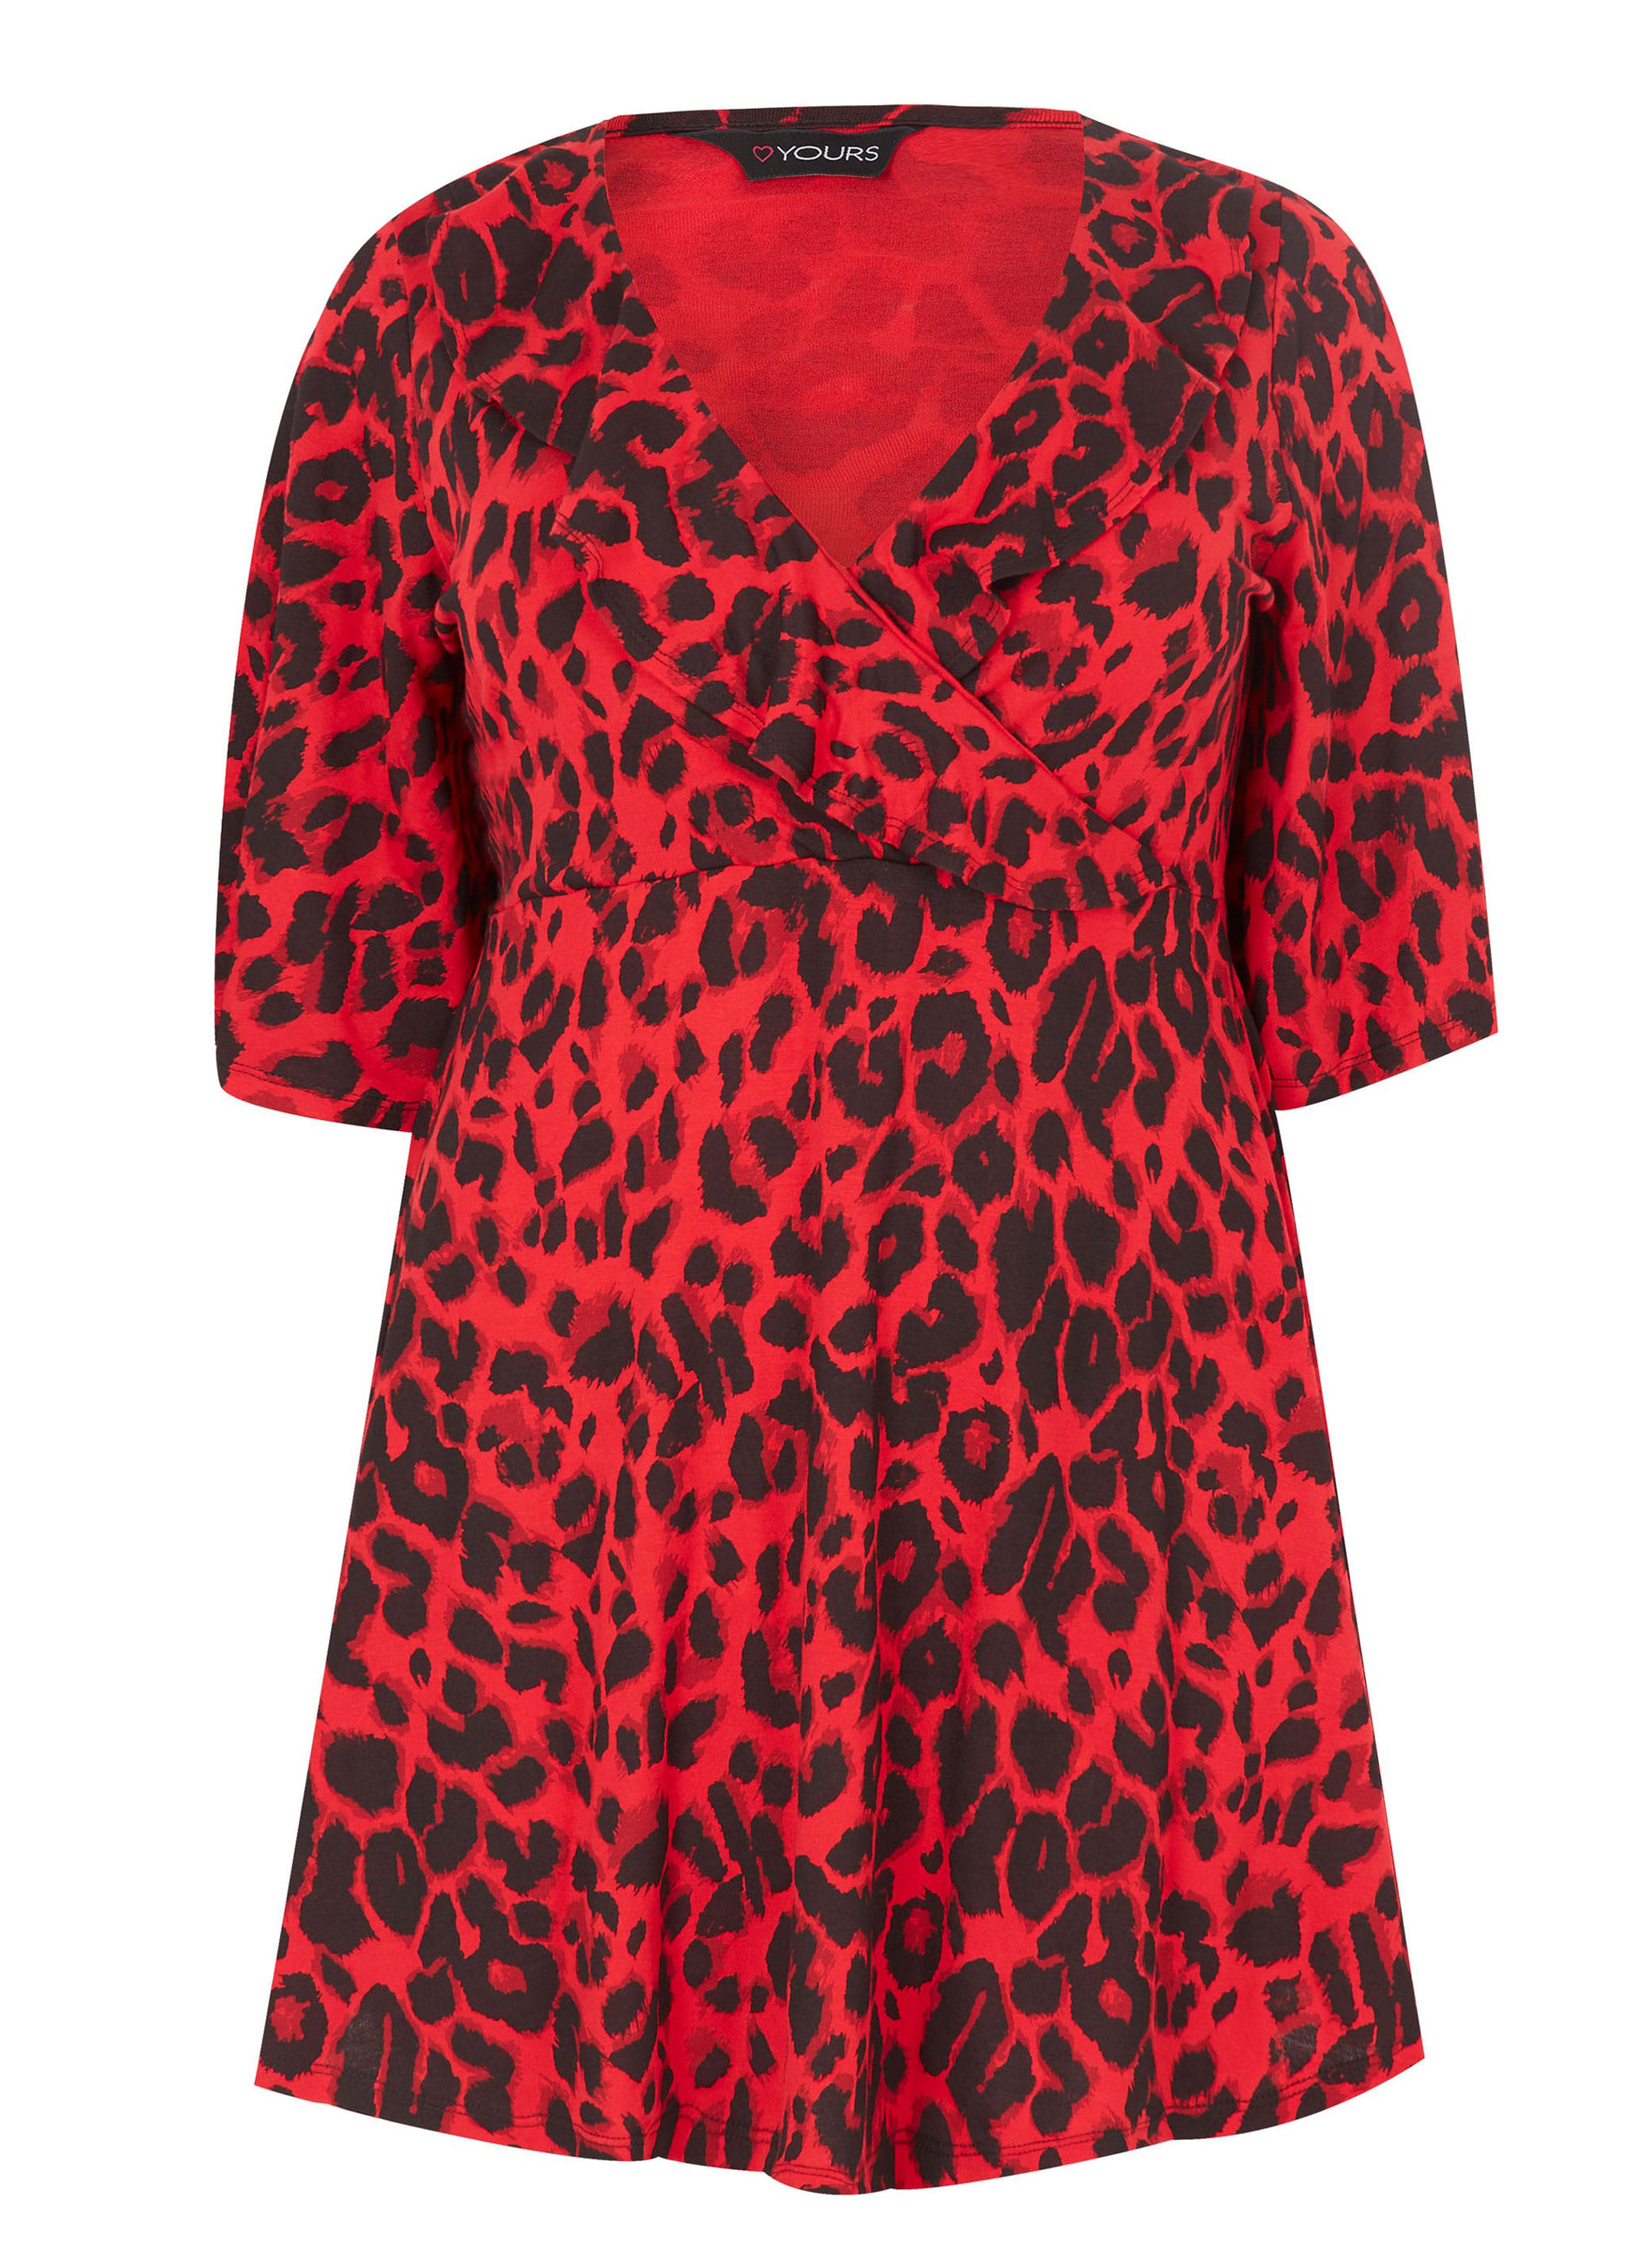 ce458feabcf ΜΠΛΟΥΖΕΣ :: Μπλούζα Κόκκινη Animal Print - Μόδα σε μεγάλα μεγέθη ...